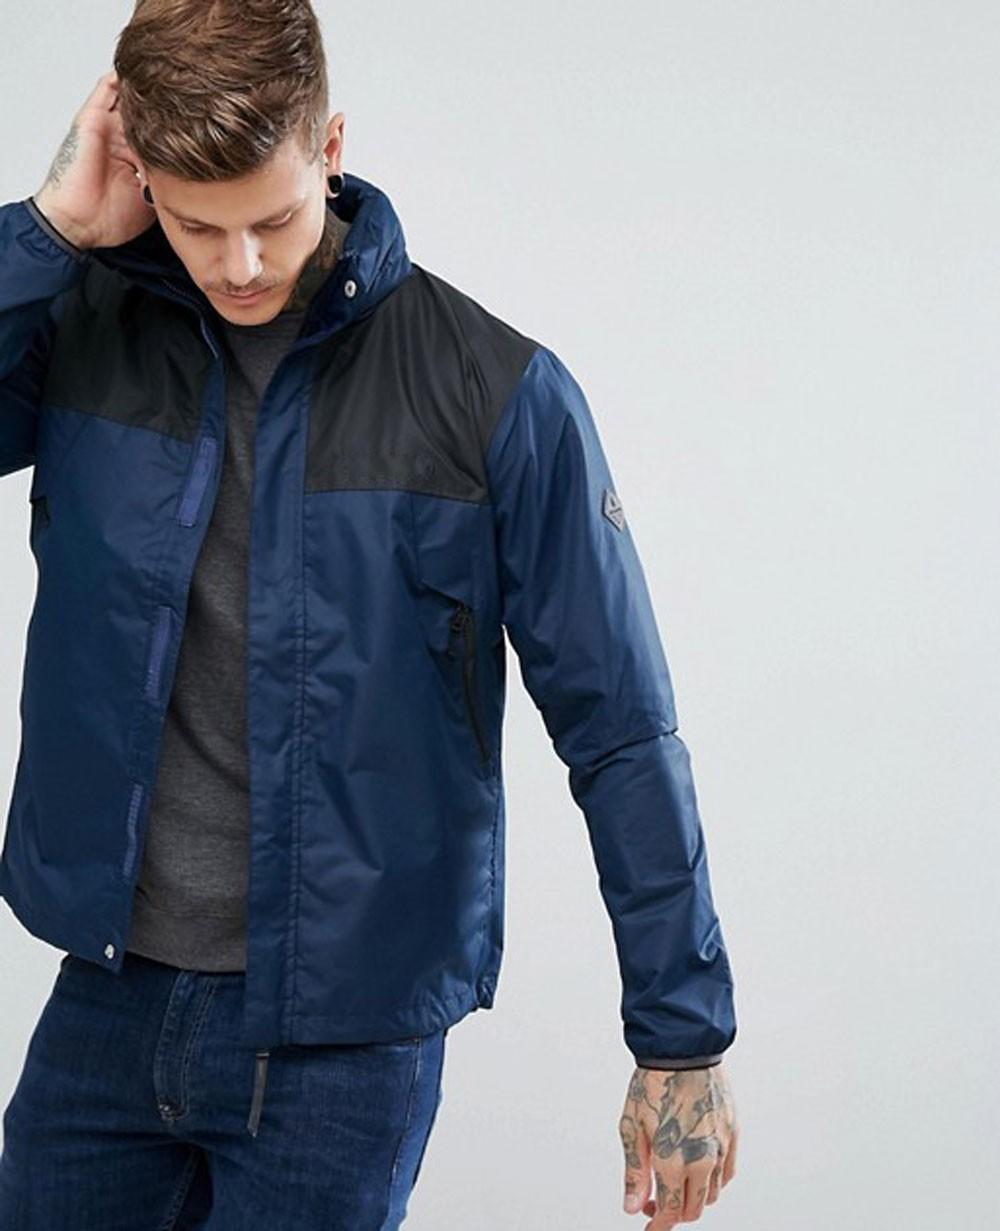 Men Custom High quality Windbreaker in Navy Jacket